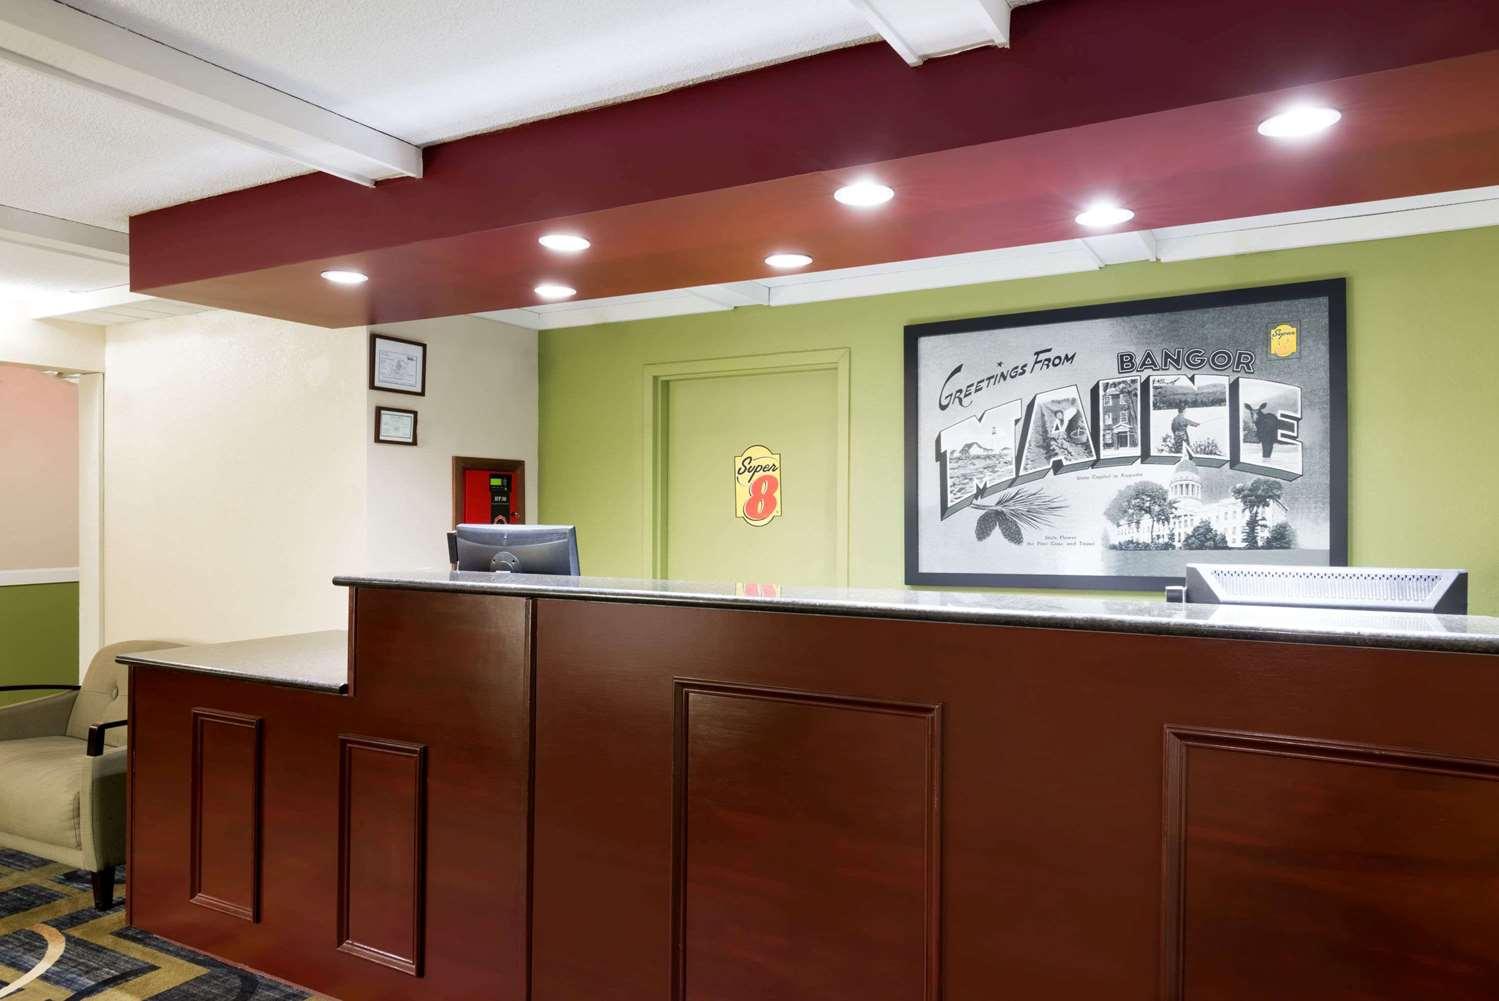 proam - Super 8 Hotel Bangor